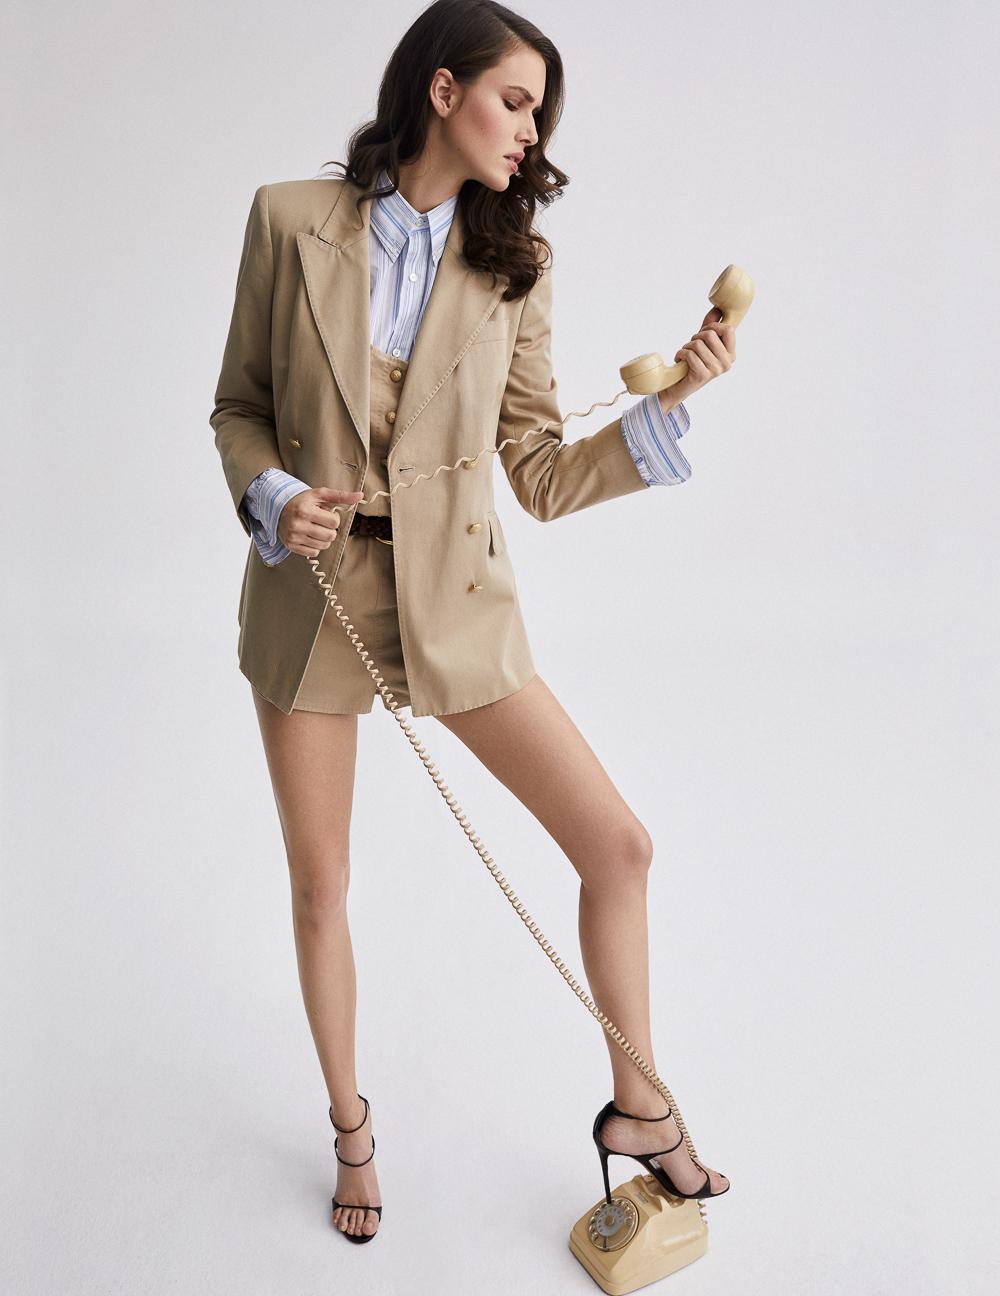 Vanessa Moody by Xavi Gordo for Elle Italia